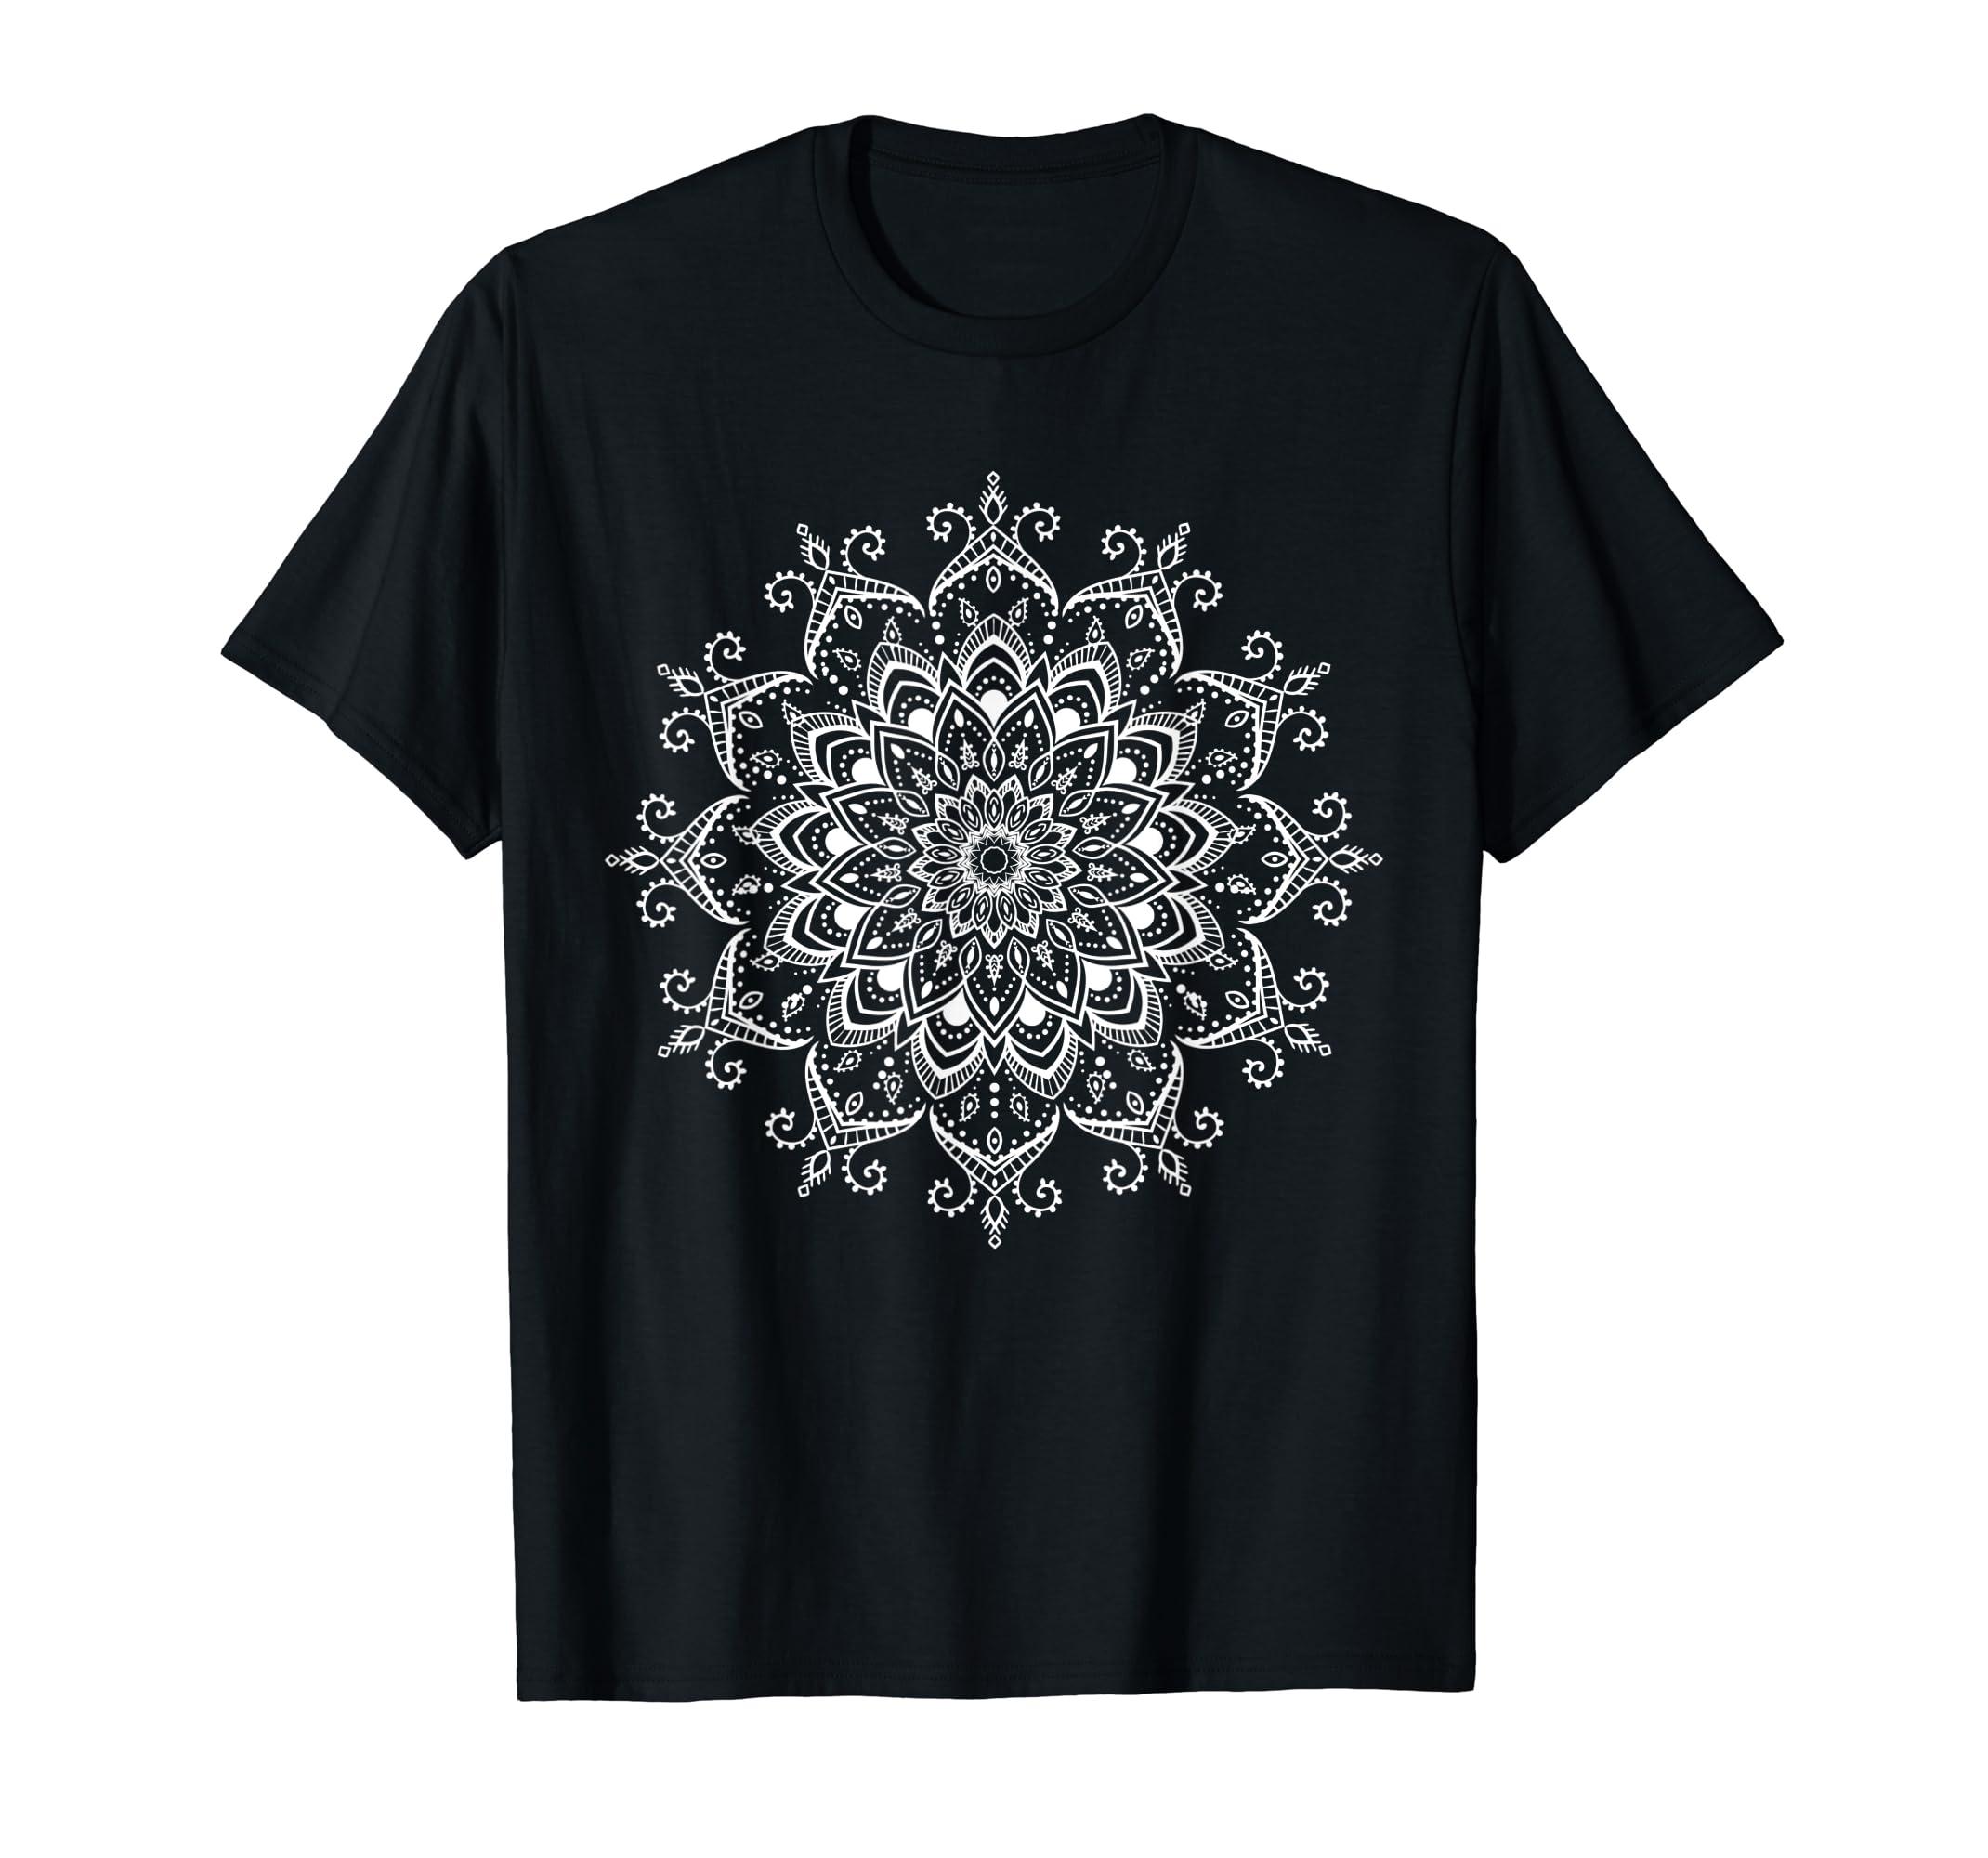 edfd42769934 Amazon.com  Yoga gift t shirt- sacred geometry Mandala tee for women   Clothing